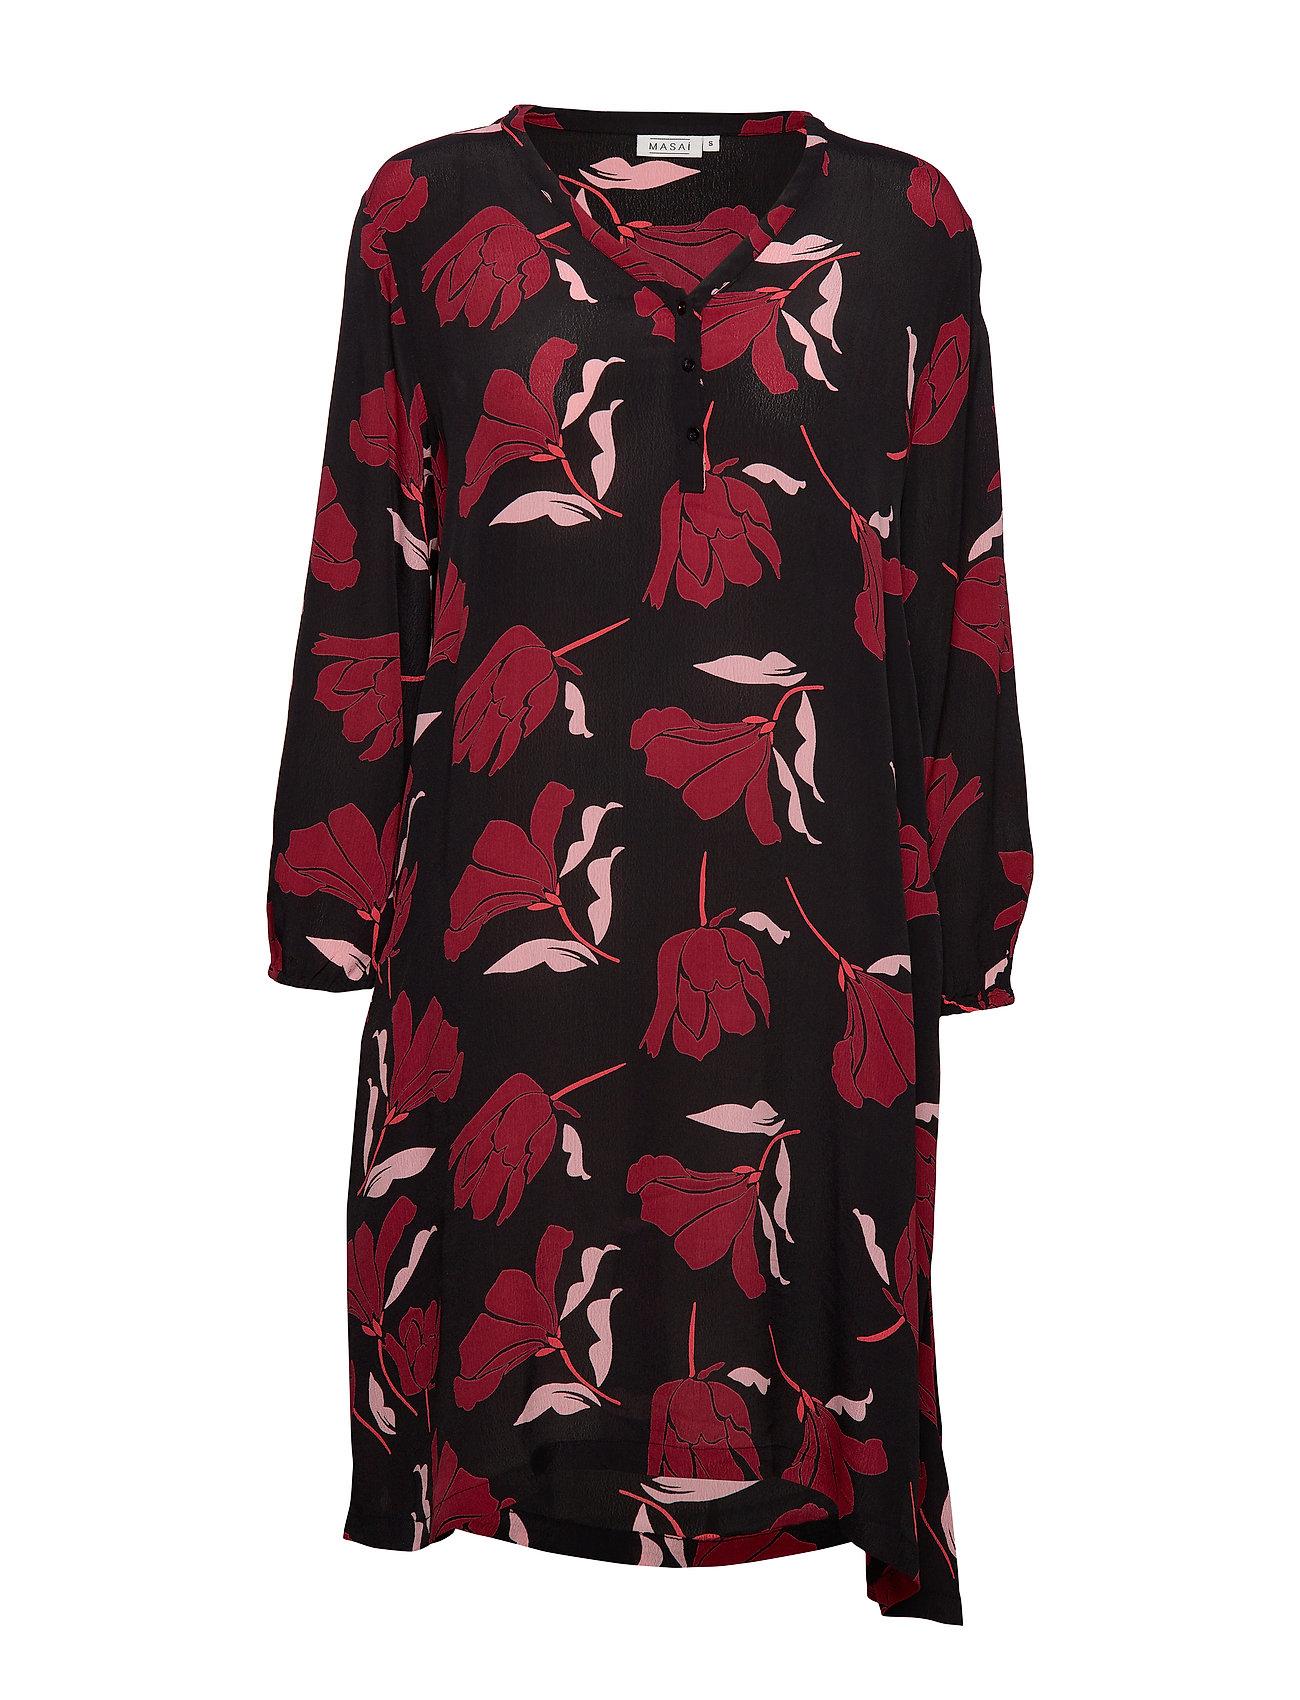 Masai Notila dress - TAWNY ORG